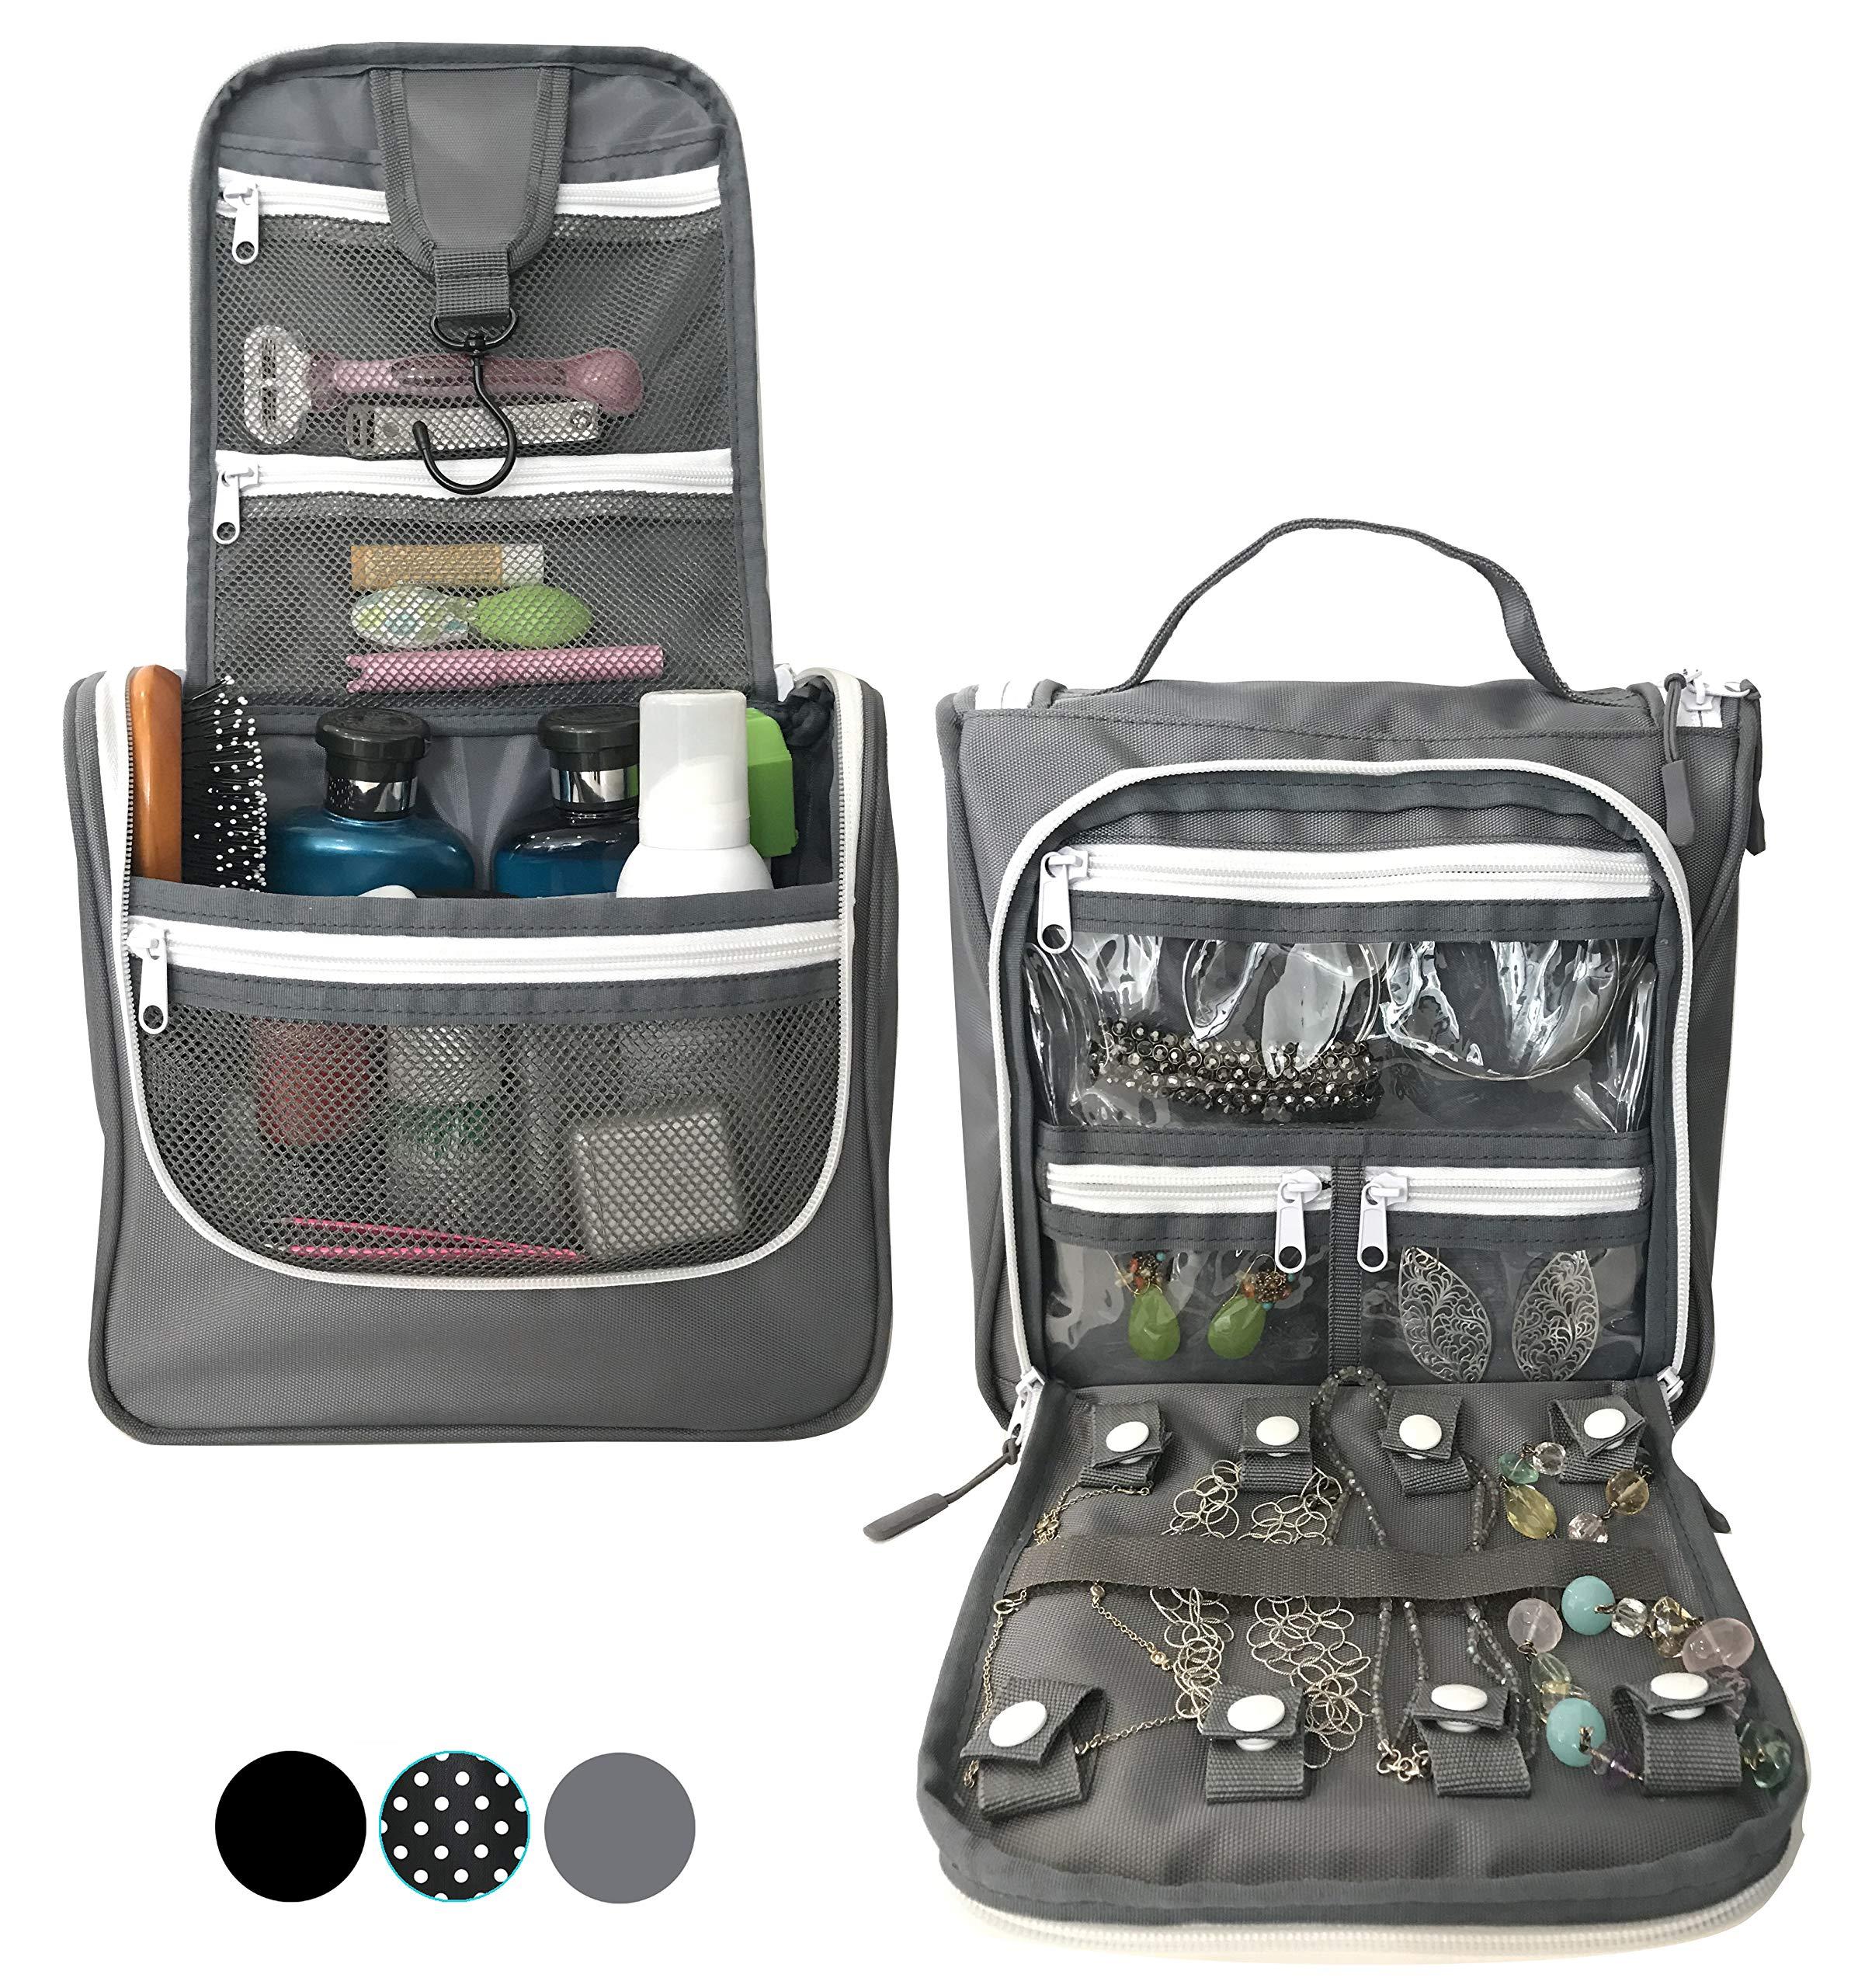 WAYFARER SUPPLY Hanging Toiletry Bag: Pack-it-flat Travel Kit, w Jewelry Organizer, Grey